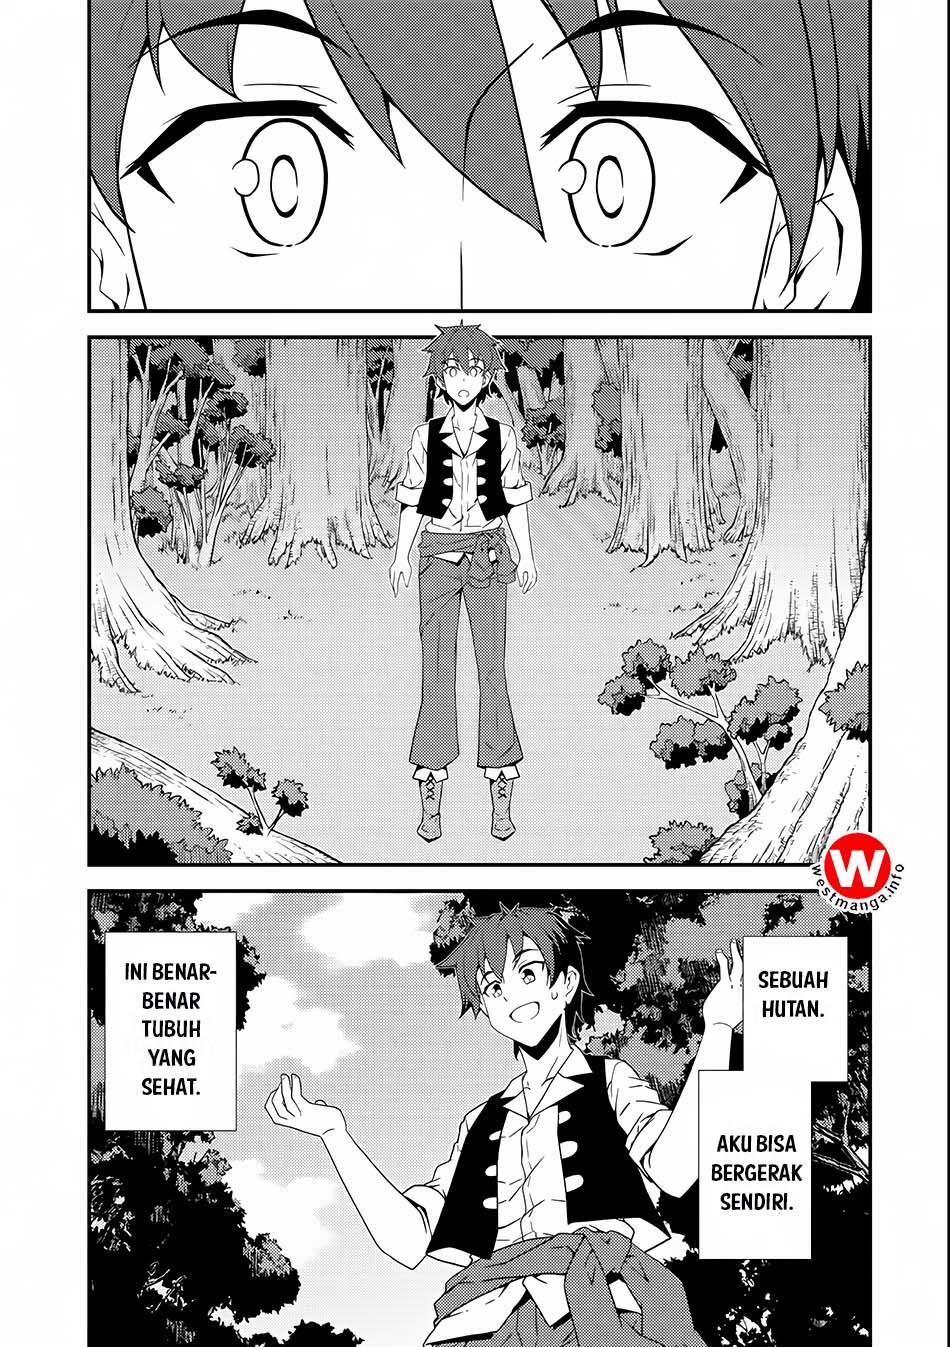 Komik isekai nonbiri nouka 001 - chapter 1 2 Indonesia isekai nonbiri nouka 001 - chapter 1 Terbaru 20|Baca Manga Komik Indonesia